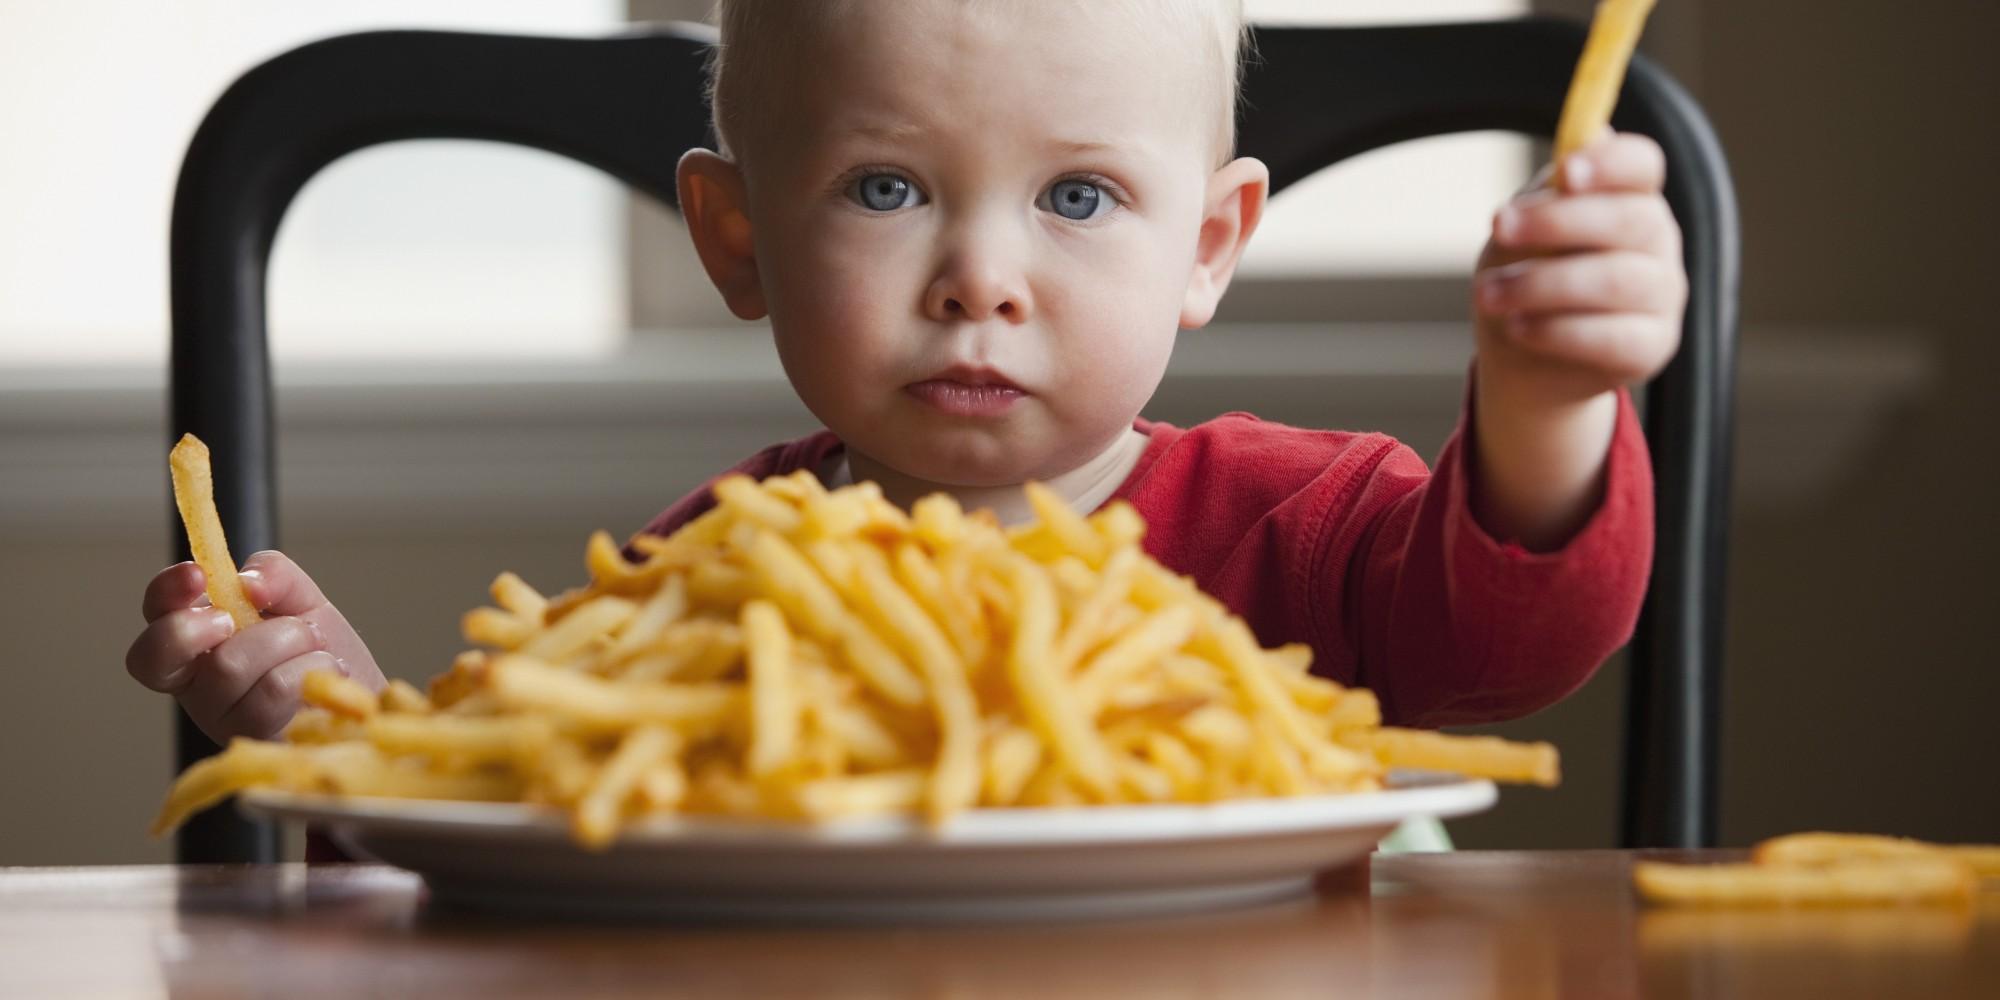 вред фастфуда для детей